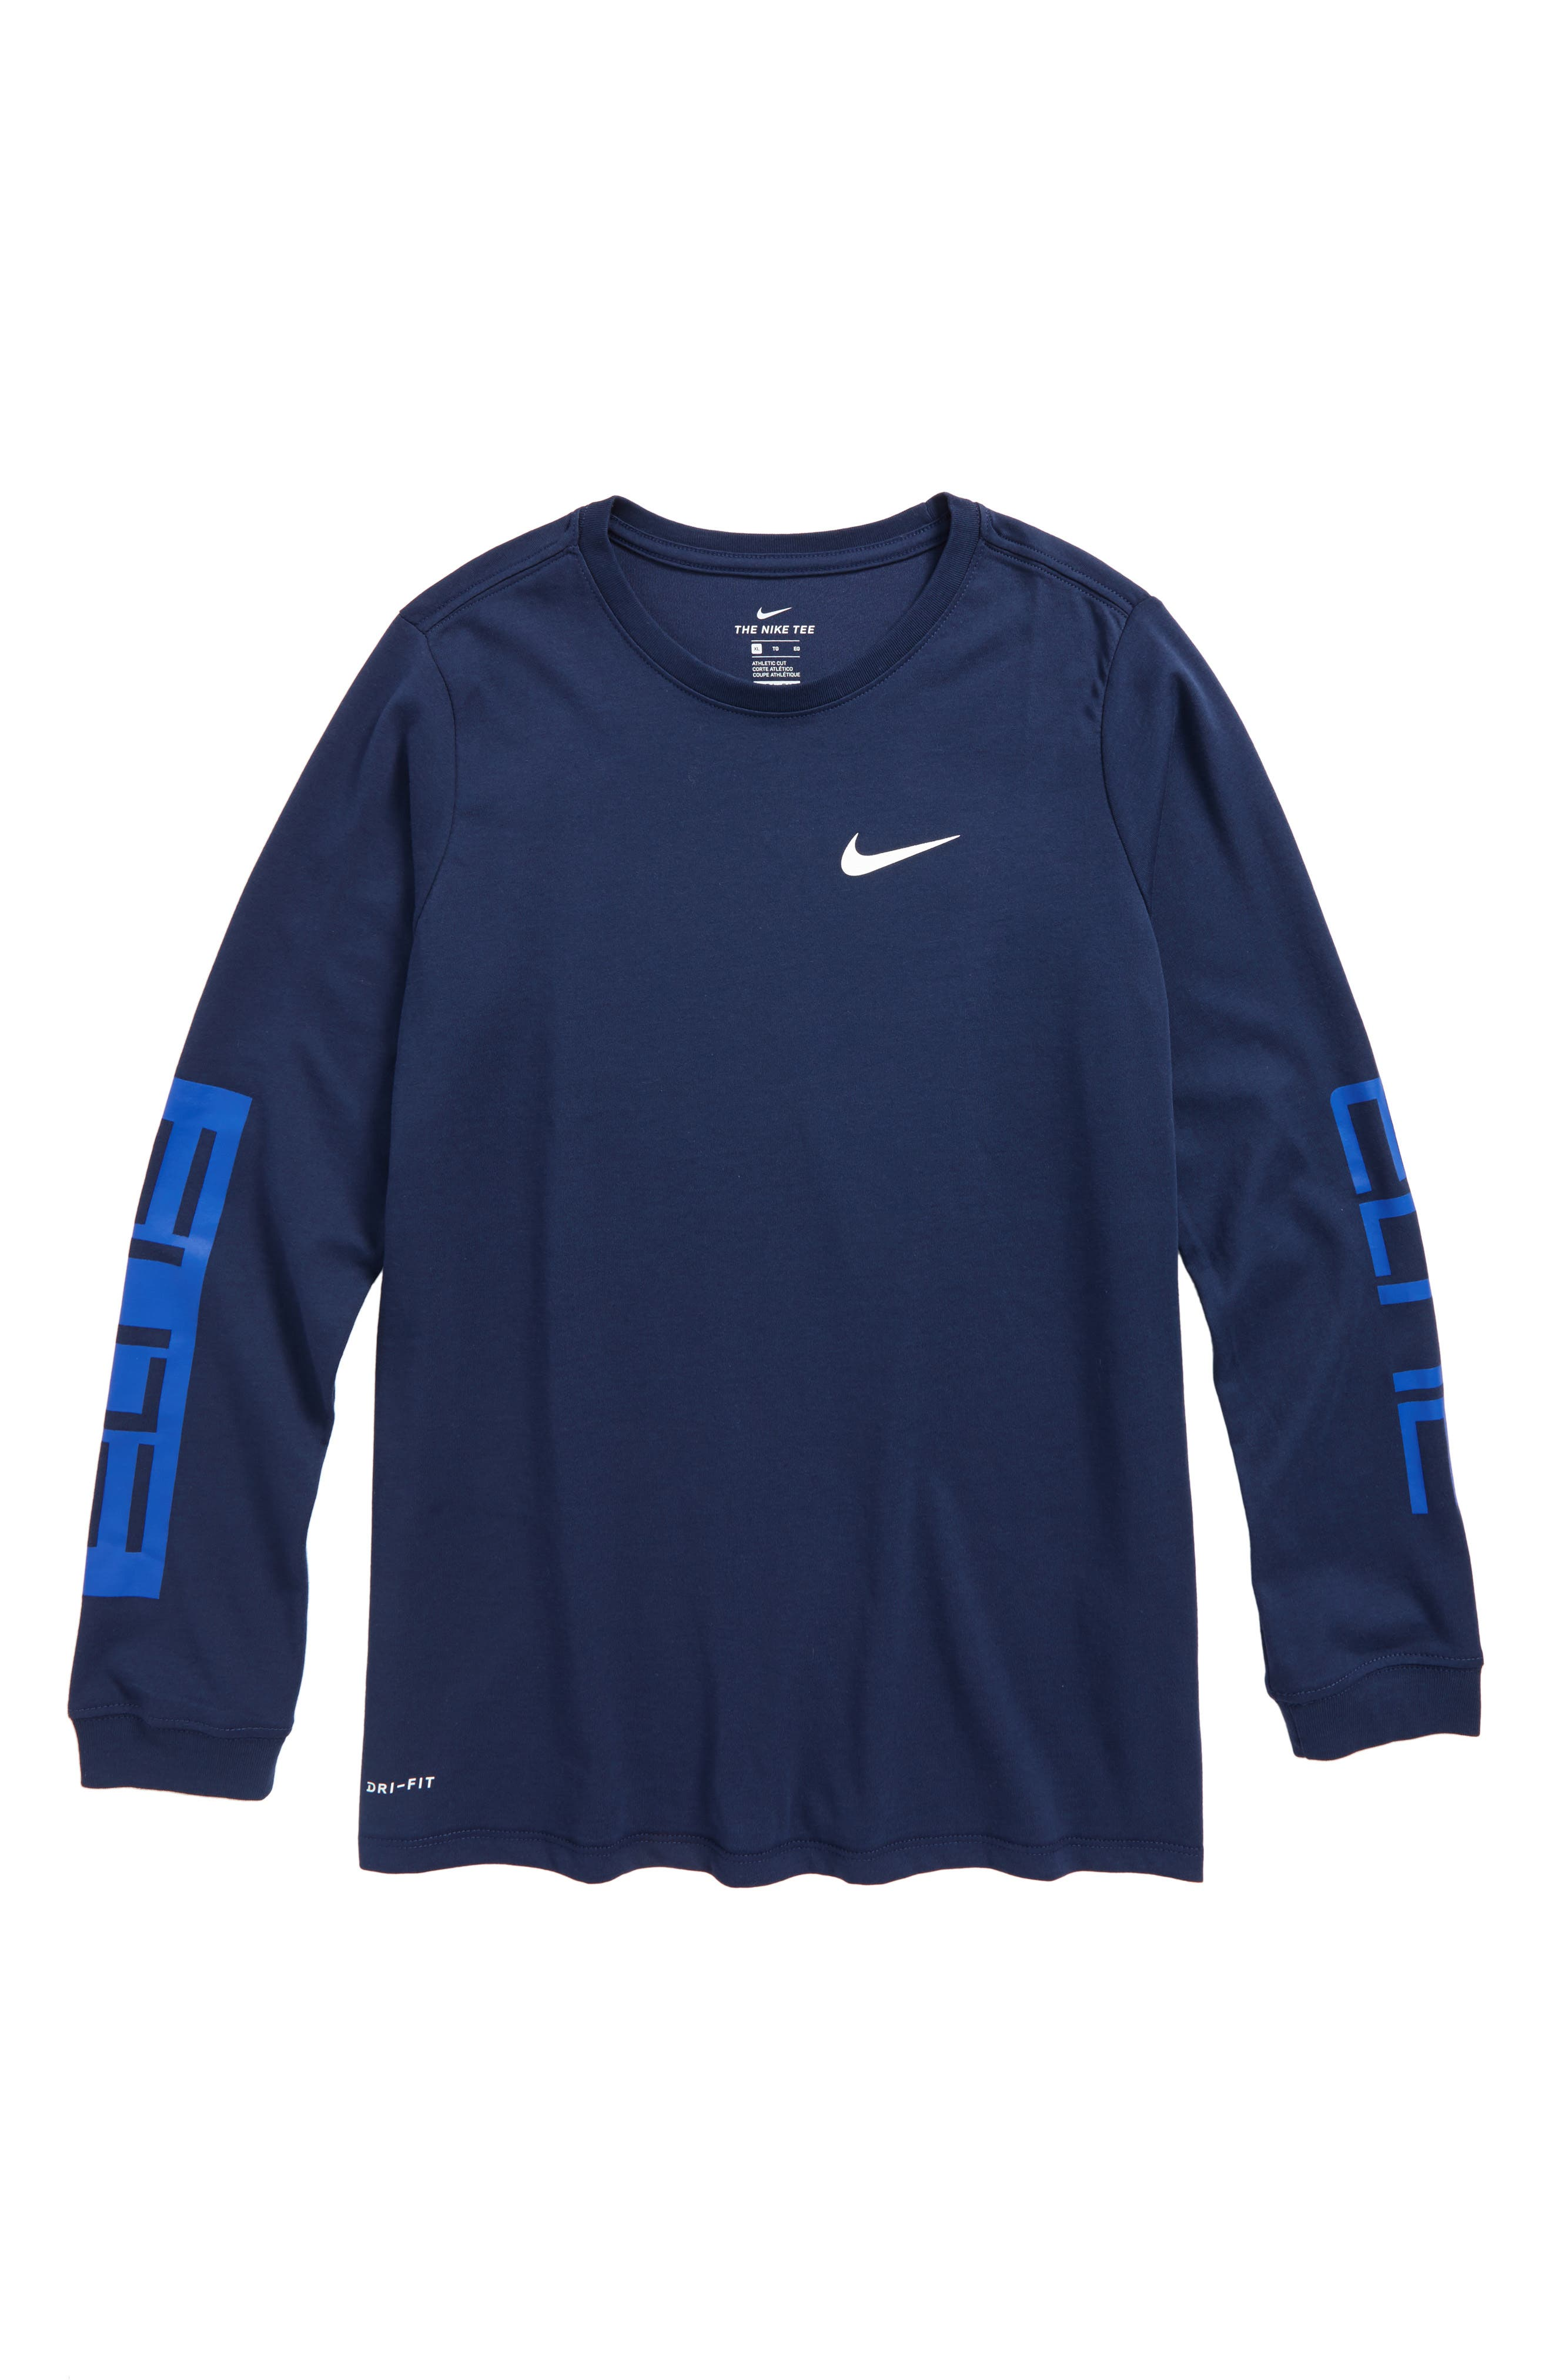 Dry Elite Long Sleeve T-Shirt,                             Main thumbnail 1, color,                             Midnight Navy